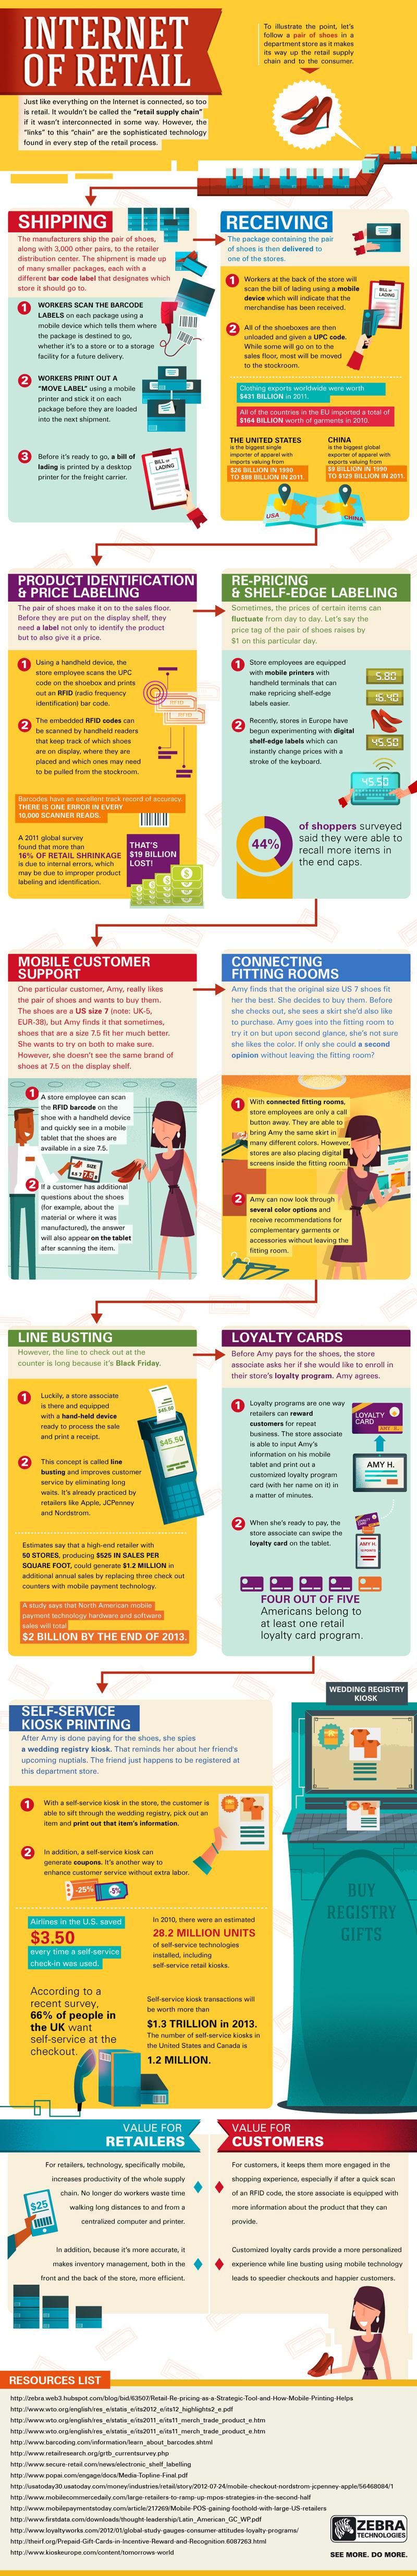 internet-of-retail_529d37b73be5c